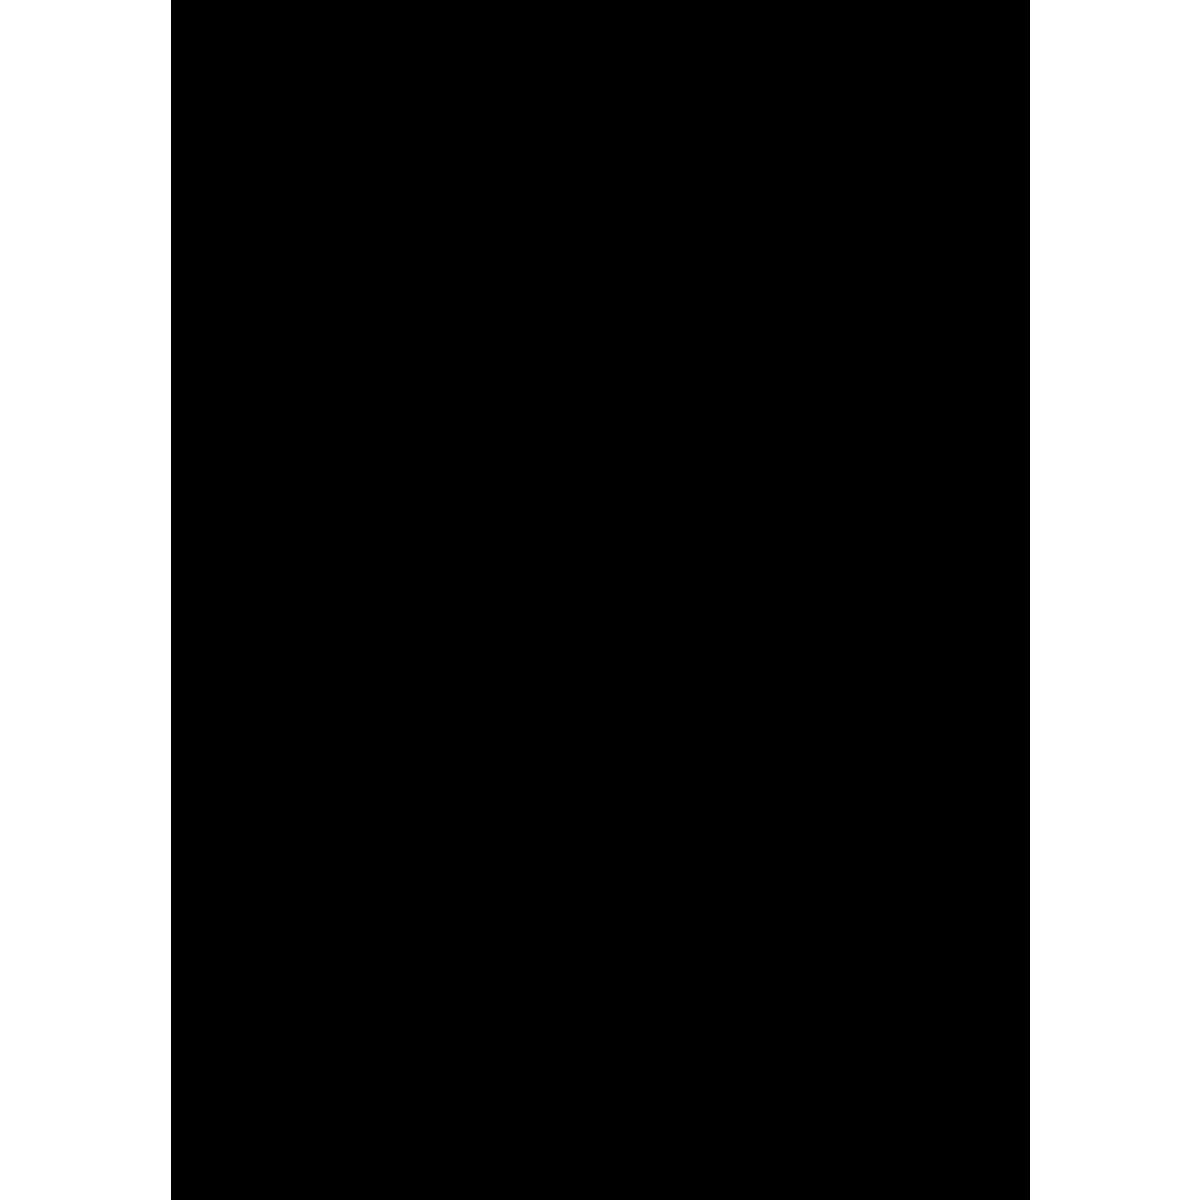 fotokarton block sonderedition din a4 10 blatt schwarz buntpapierwelt. Black Bedroom Furniture Sets. Home Design Ideas